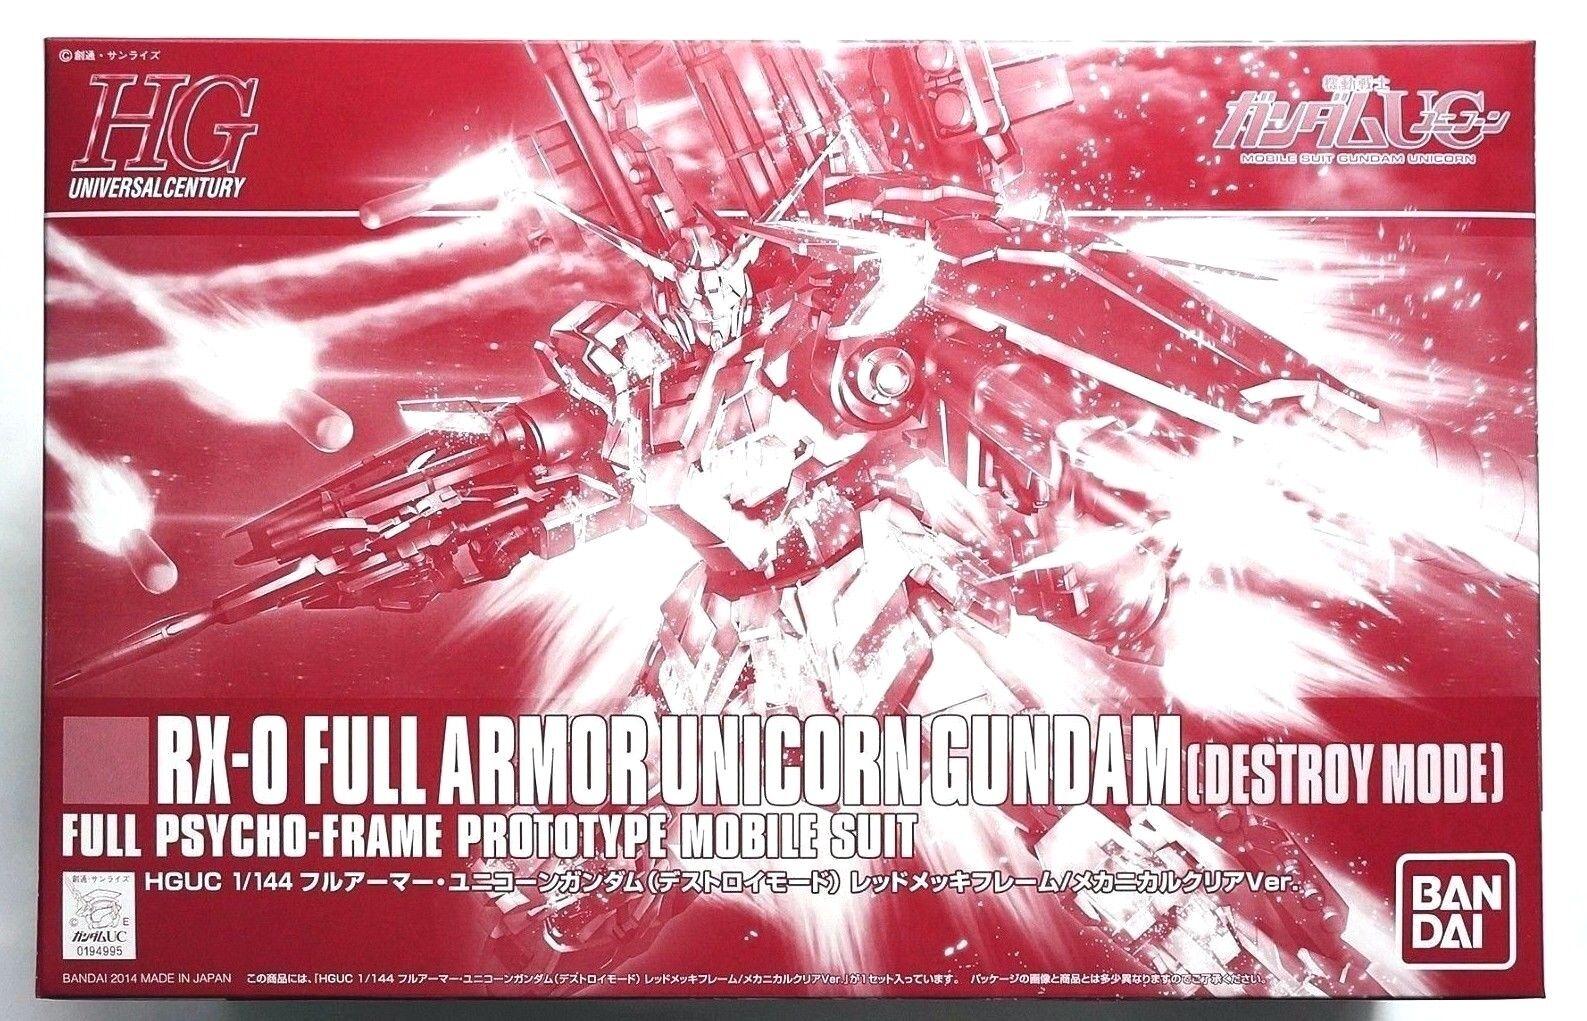 BANDAI HGUC 1  144 Full Armor Unicorn Gundam röd flamma klar än EXPO begränsad kit